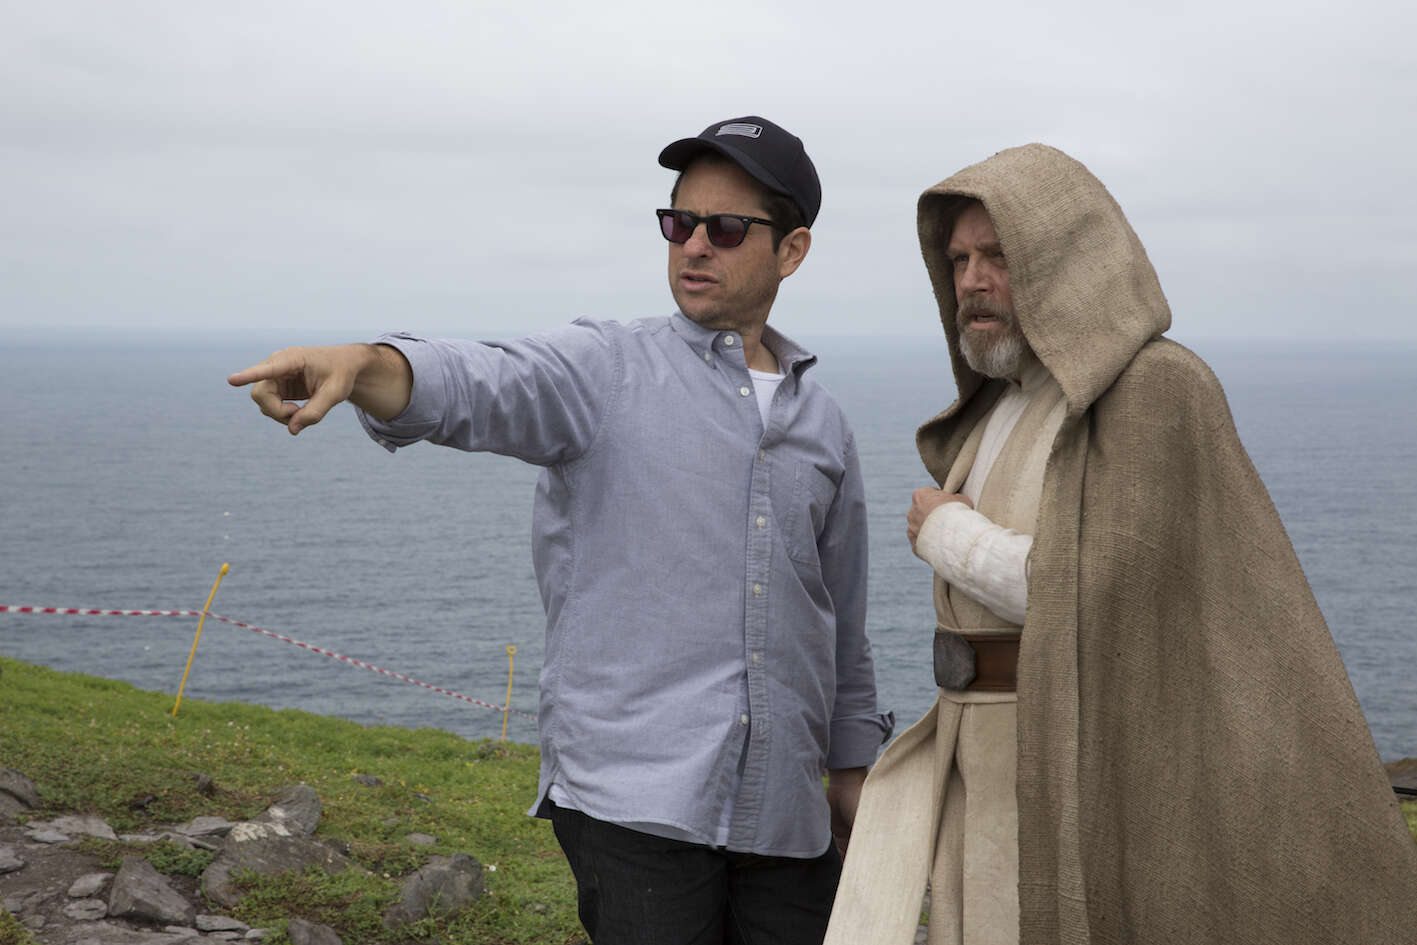 Film Set Fantasy: Go On Location in Ireland